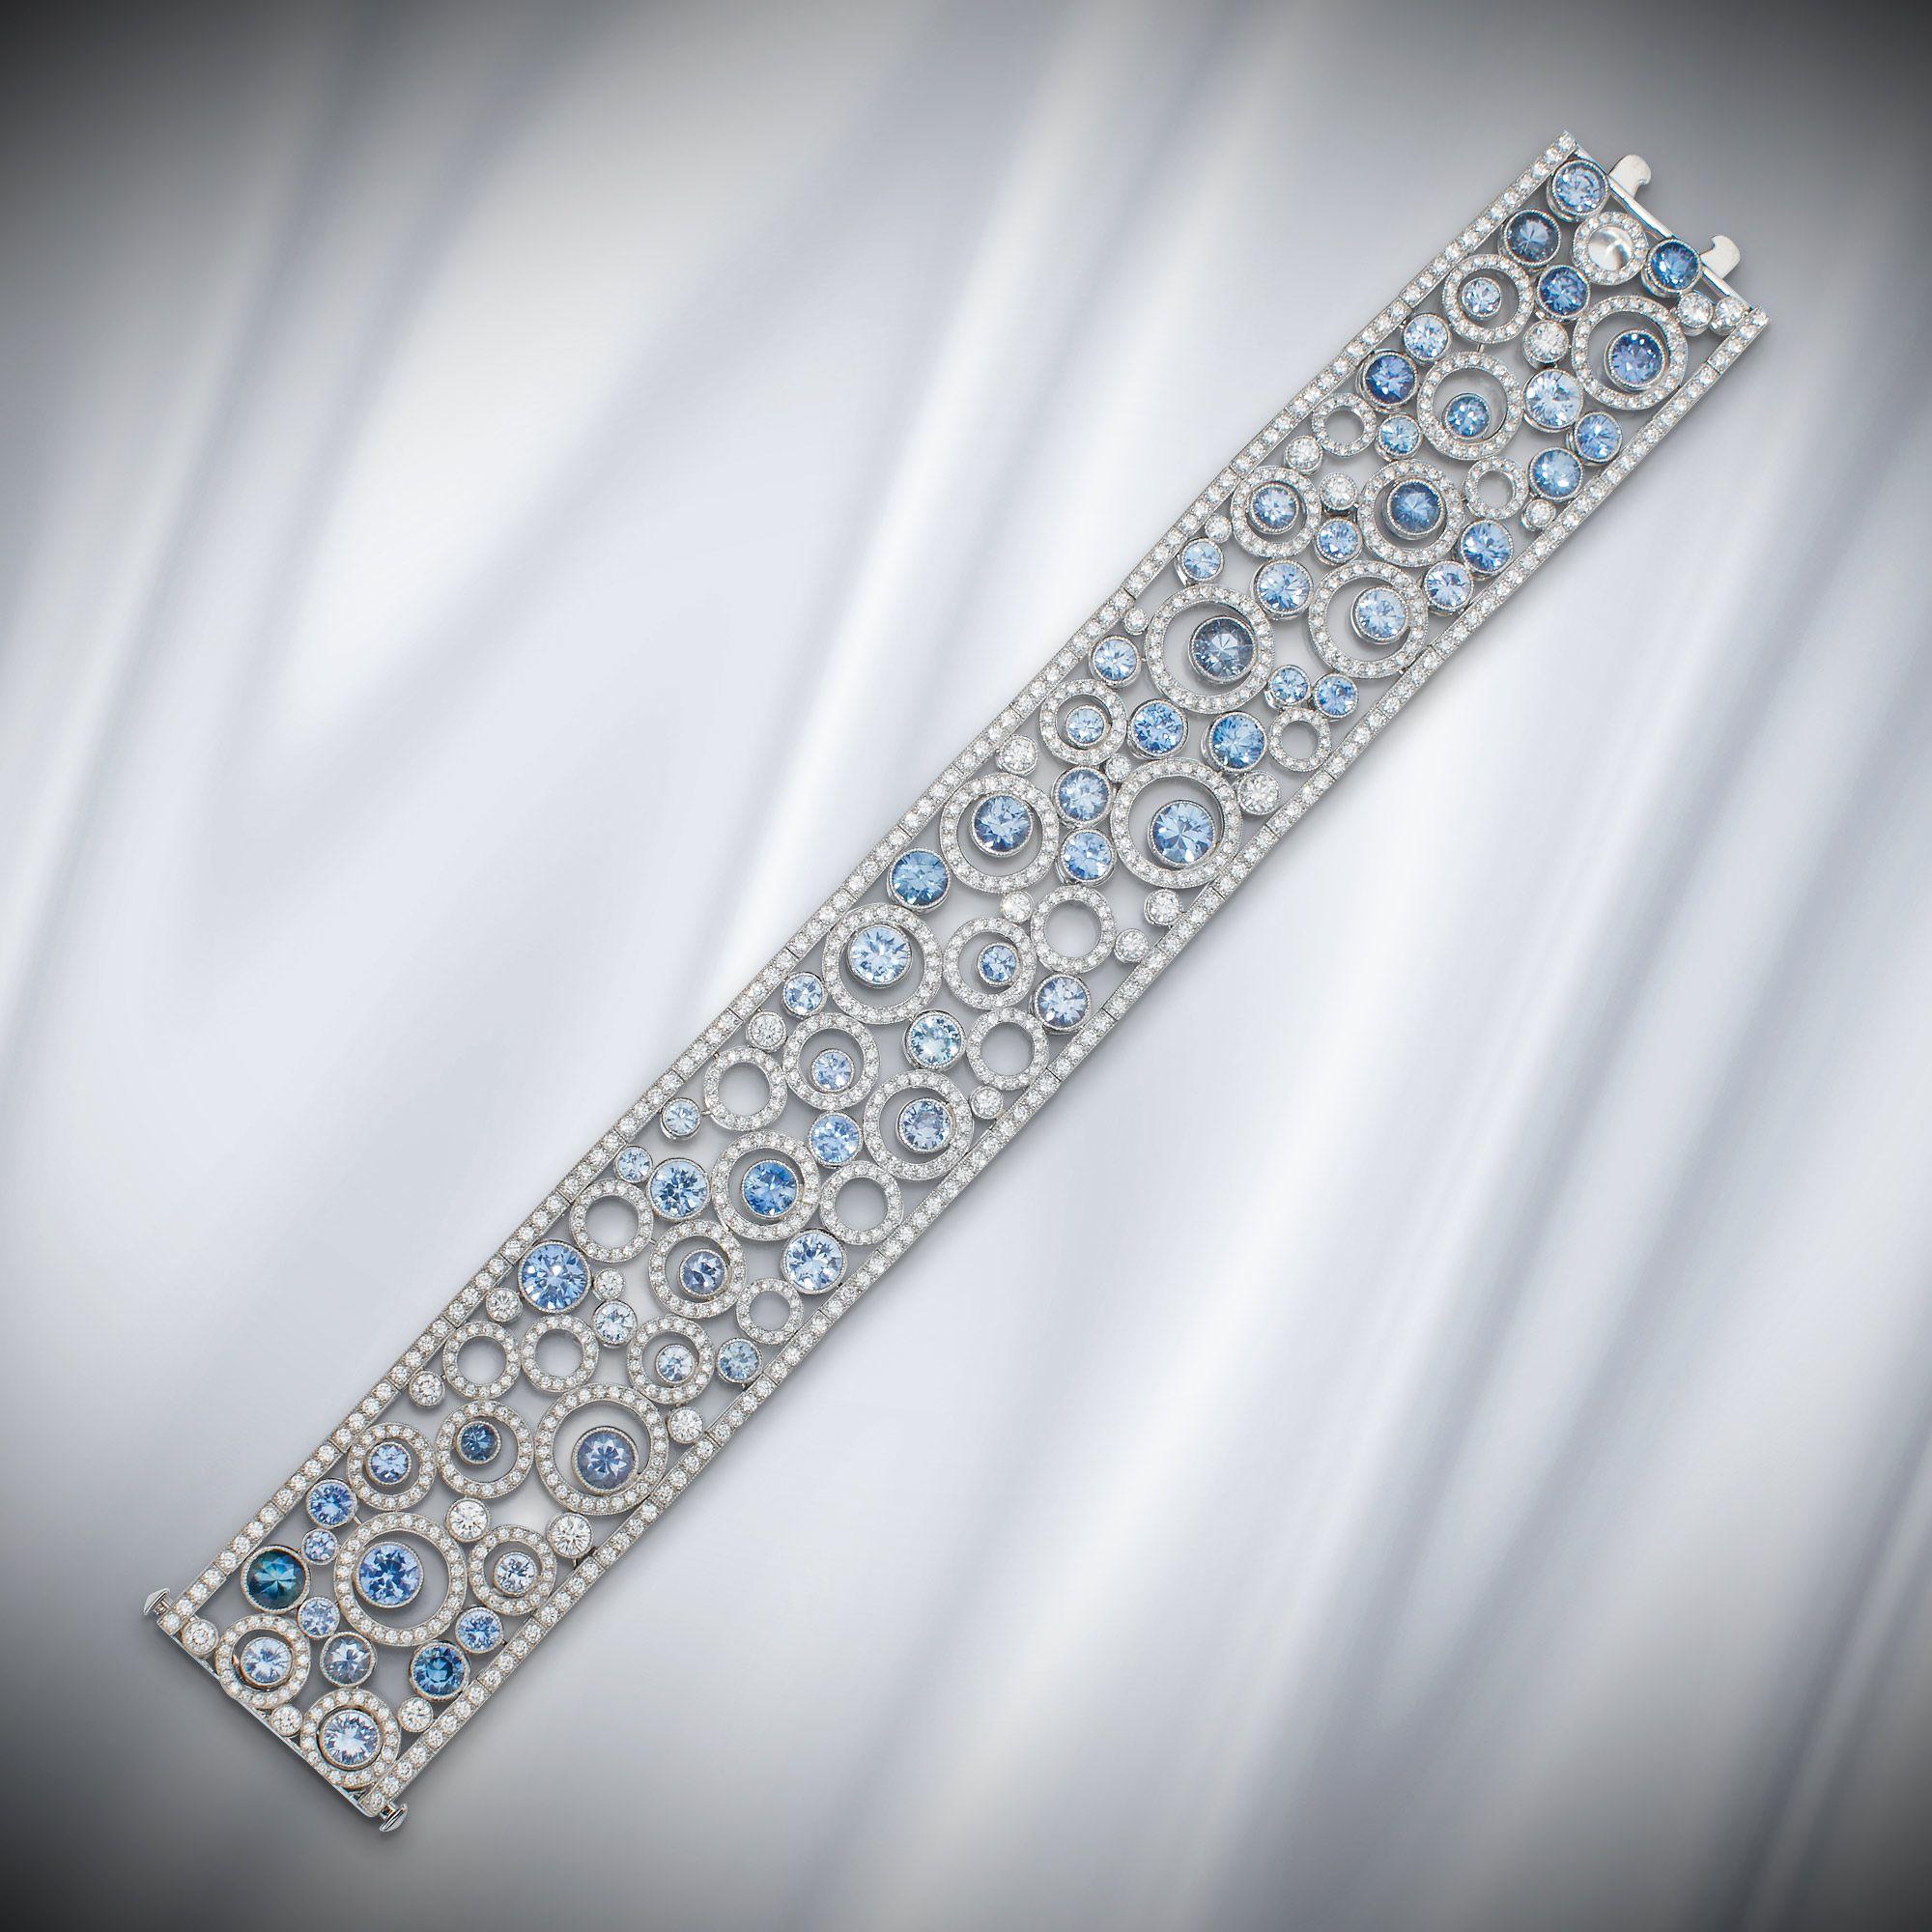 Sapphire and diamond ufloating circlesu bracelet tiffany u co from